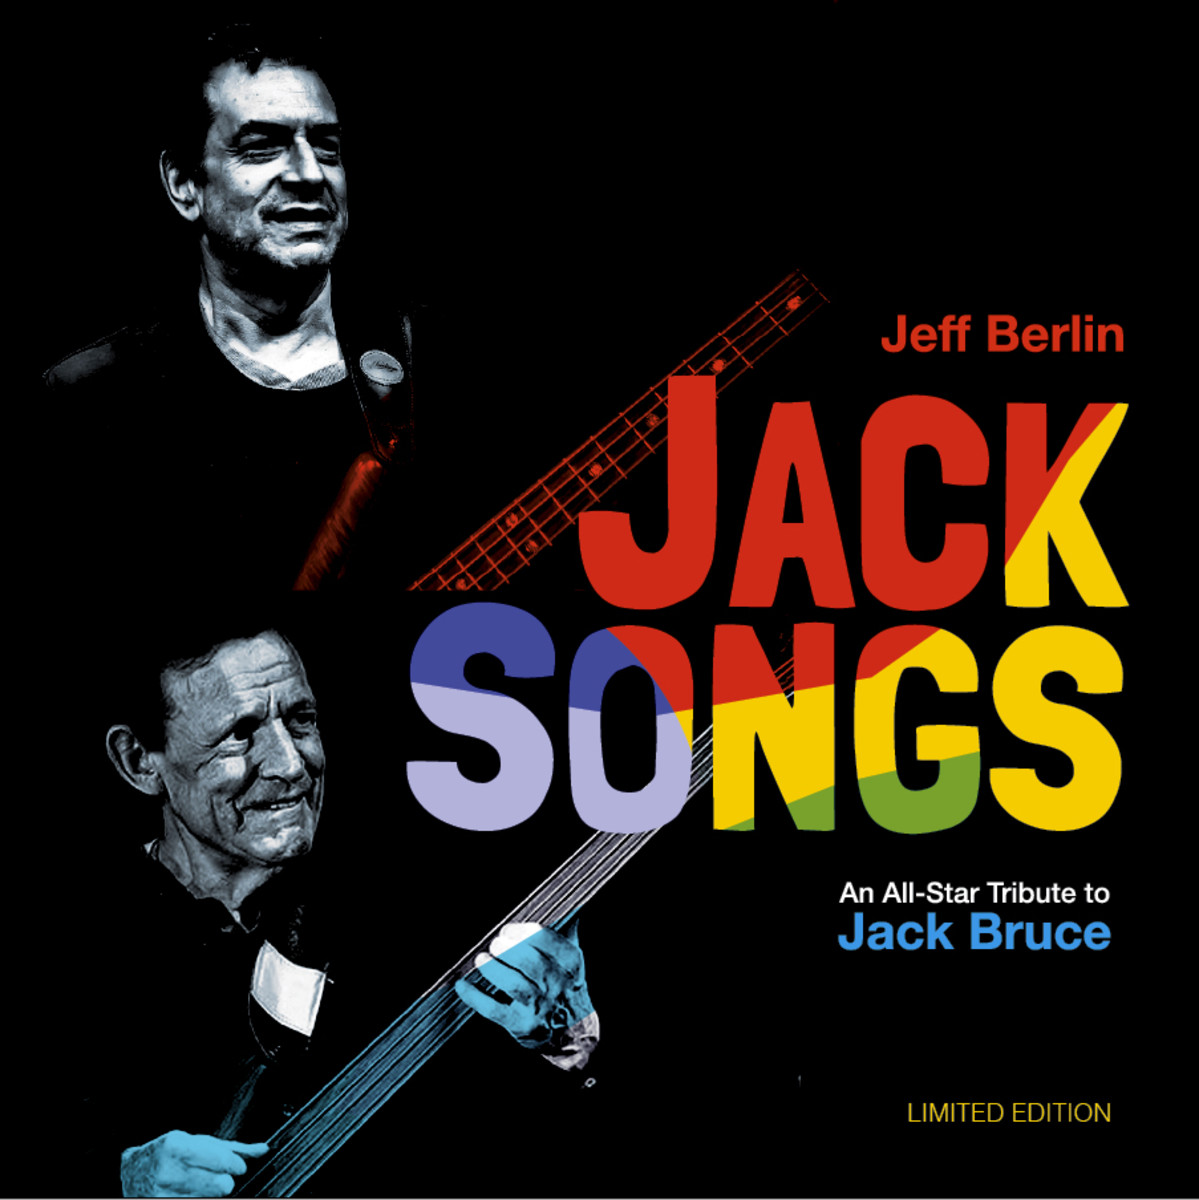 Jack Bruce tribute over